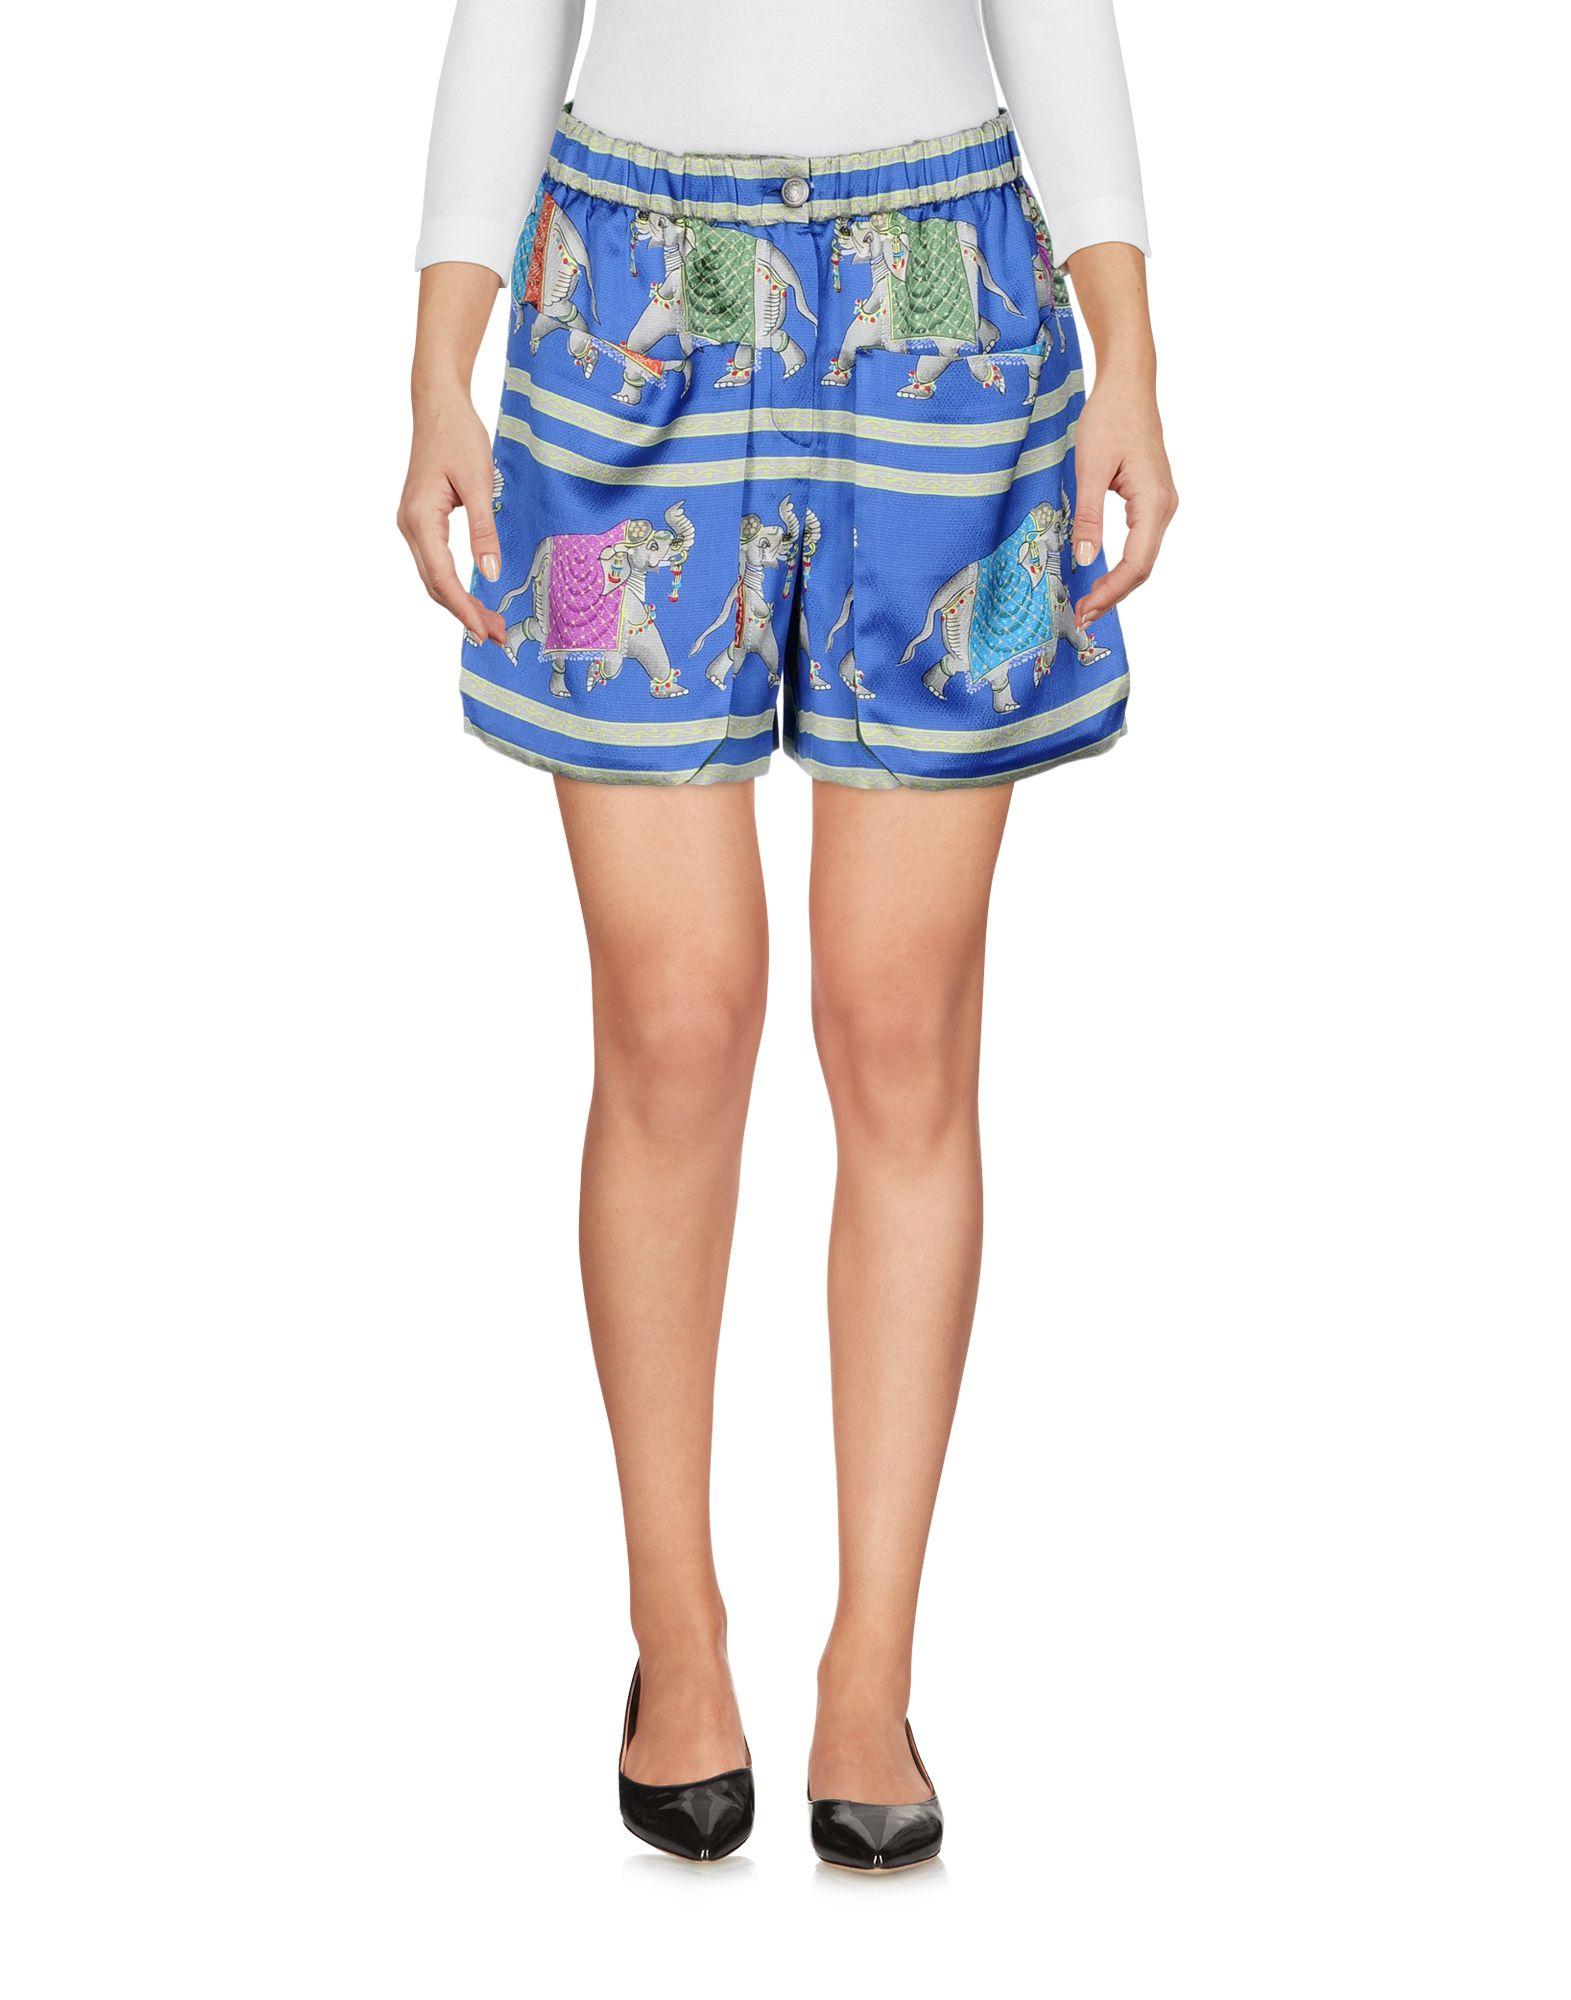 Shorts Emporio Armani Donna - Acquista online su d569cGd